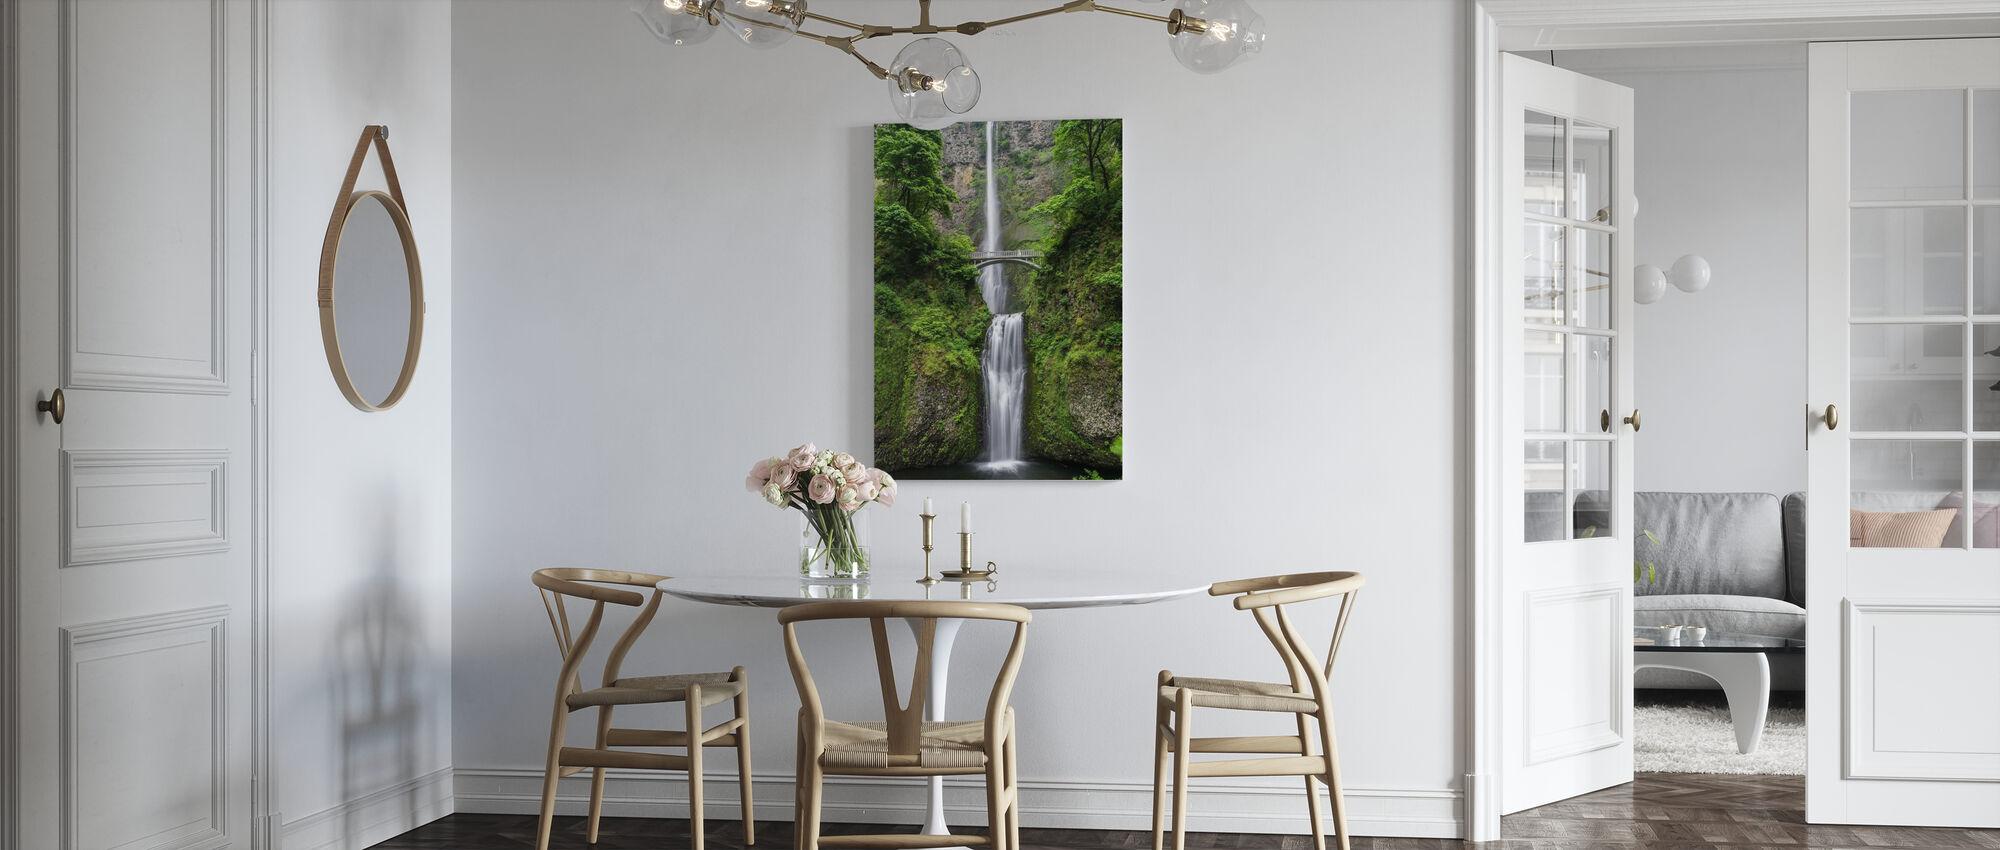 Bridge and Waterfall - Canvas print - Kitchen